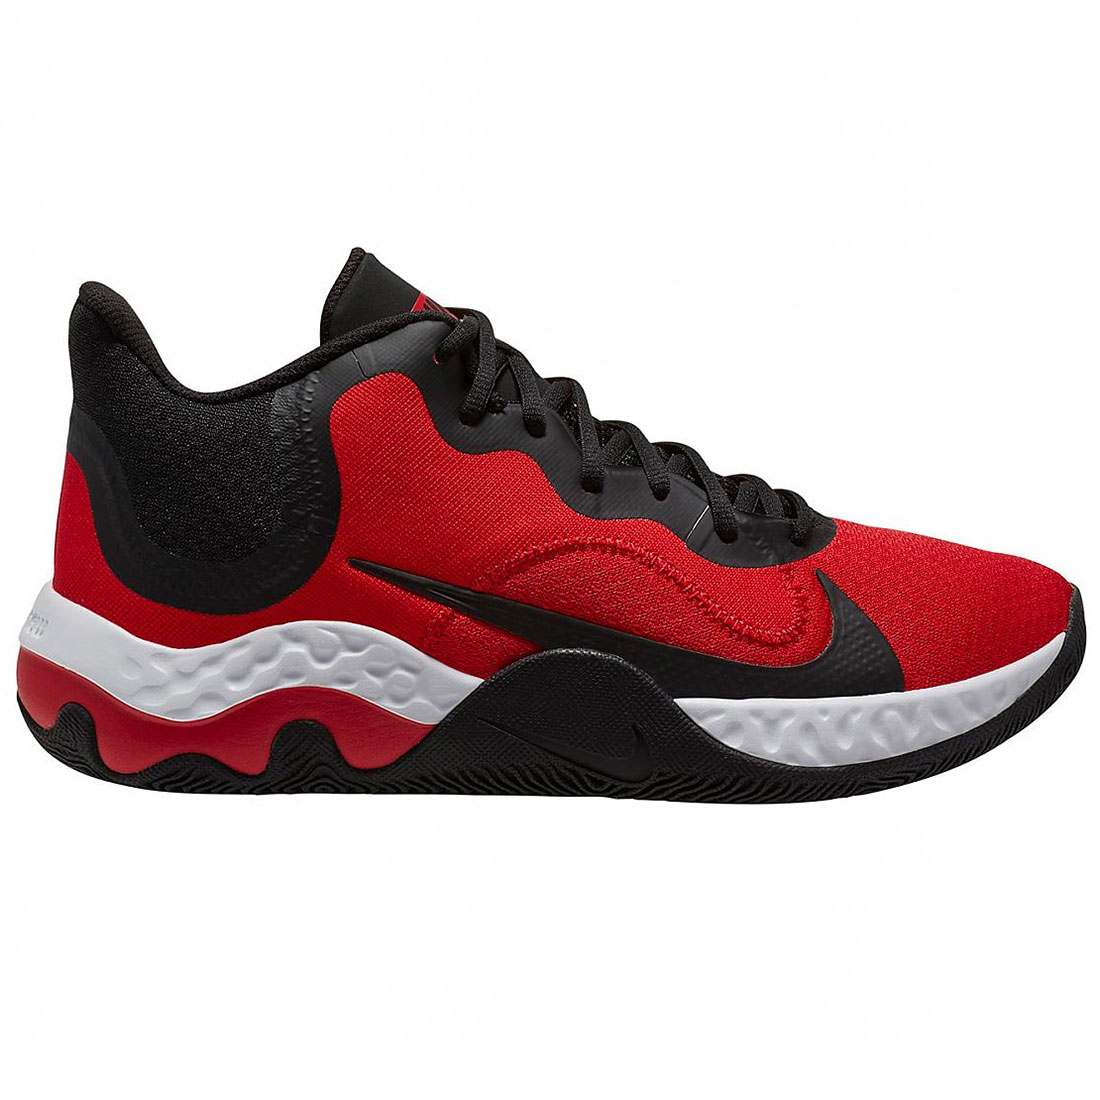 Nike Renew Elevate Basketballschuhe schwarz rot